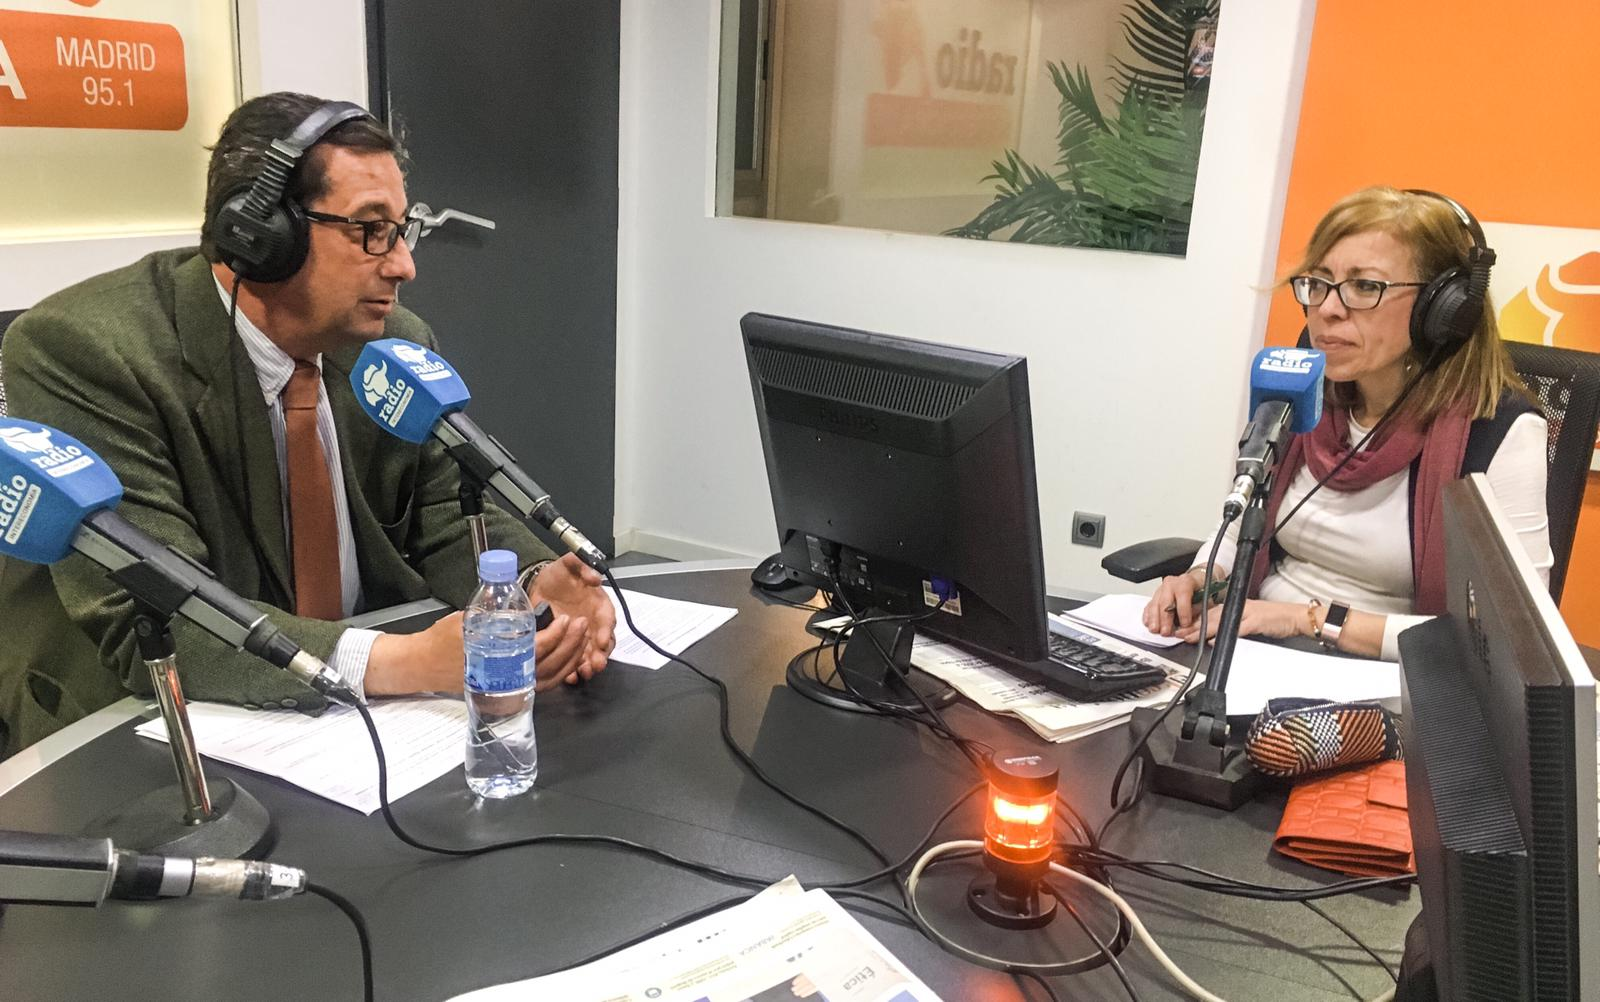 Radio Intereconomia 1